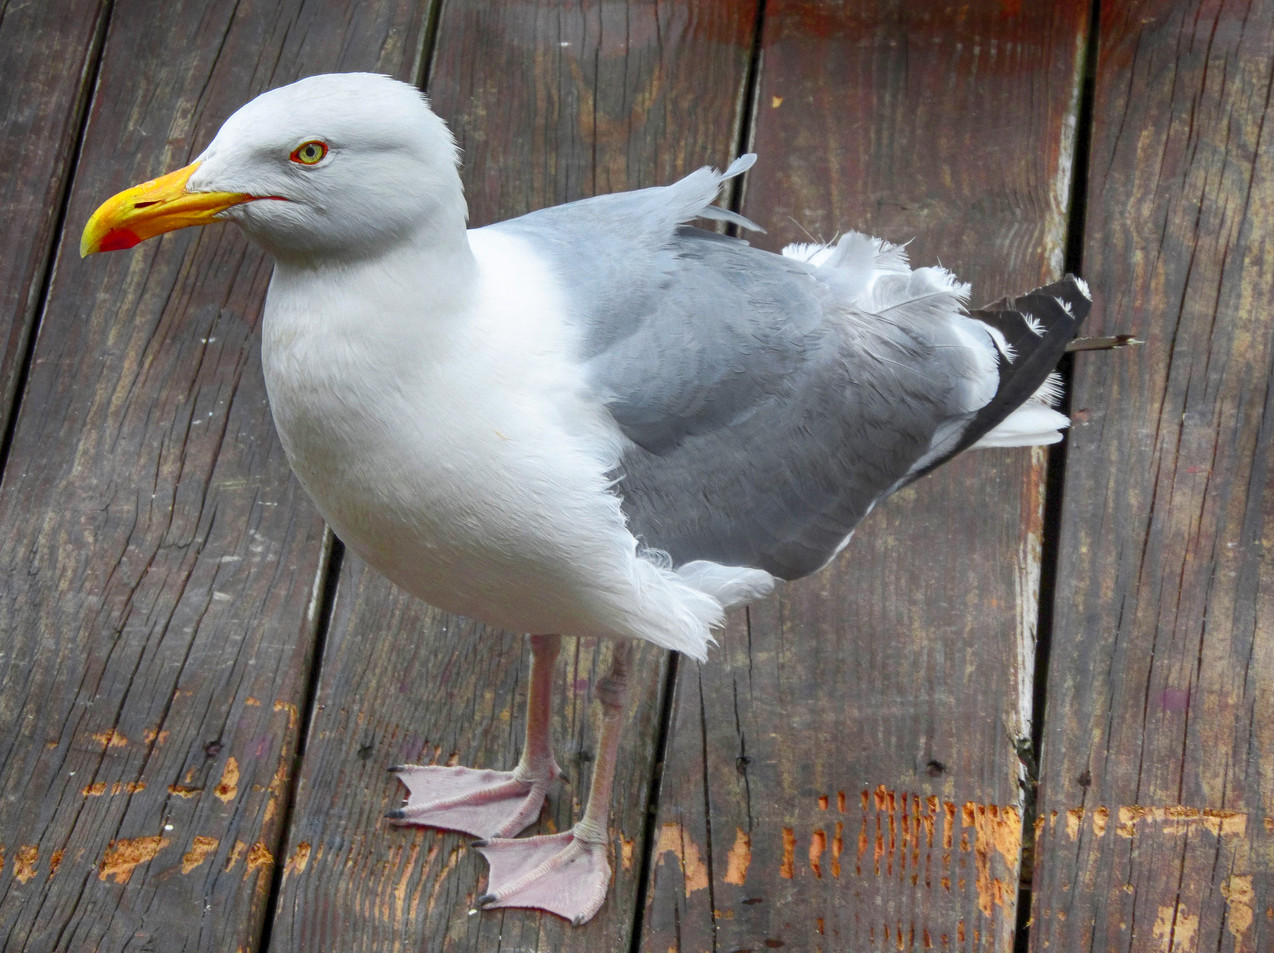 A Boston Seagull